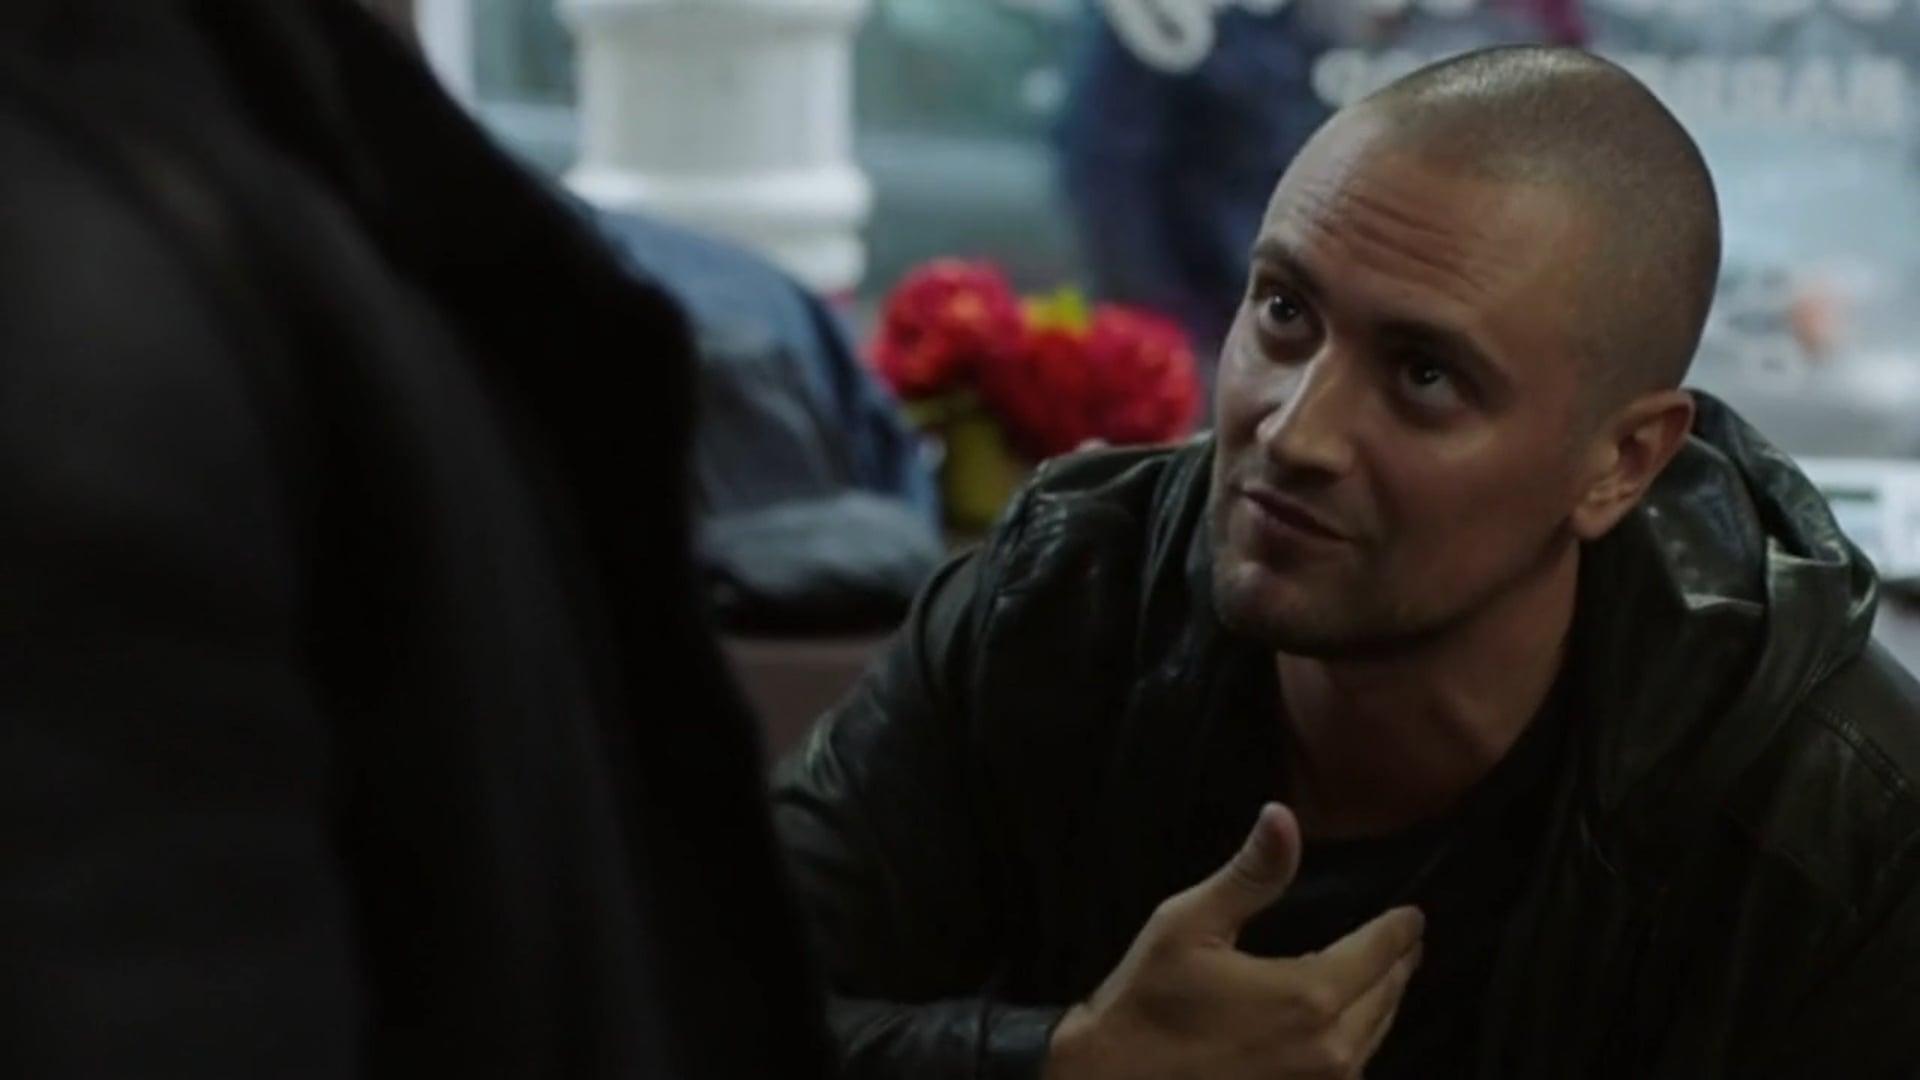 Aleksandar Popovic as Petar in POWER - Season 4